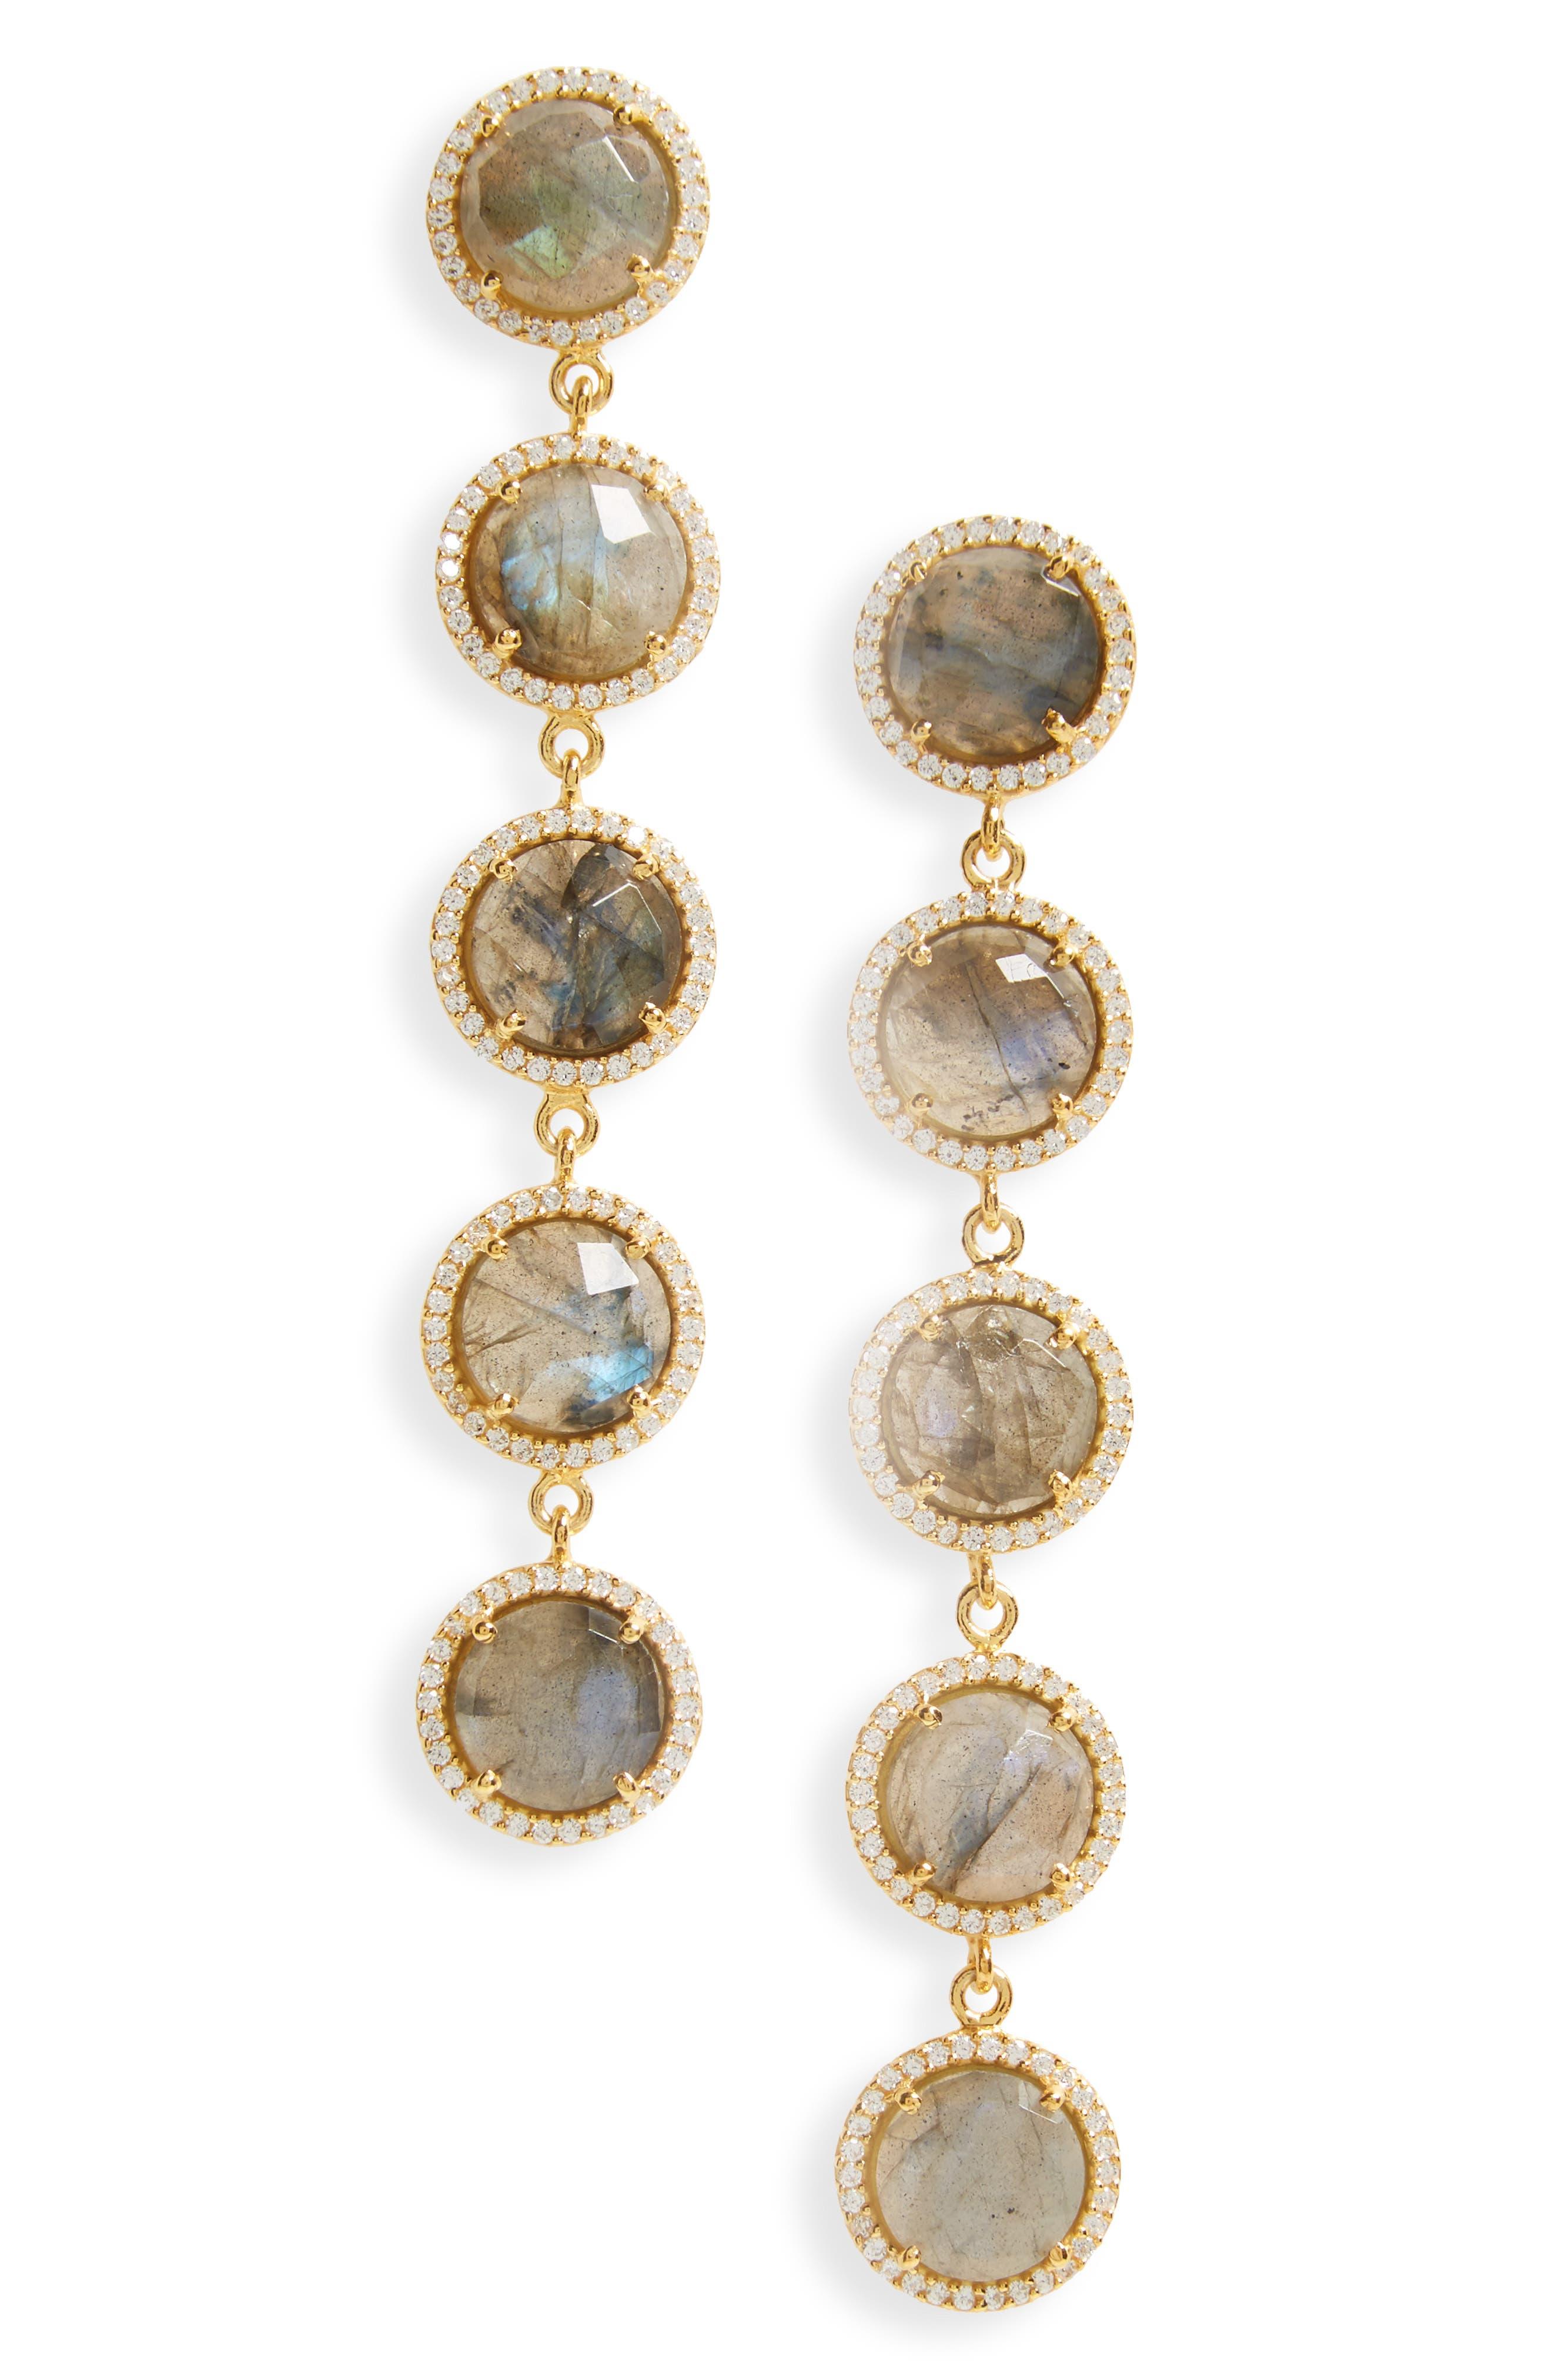 Susan Hanover Five-Stone Drop Earrings